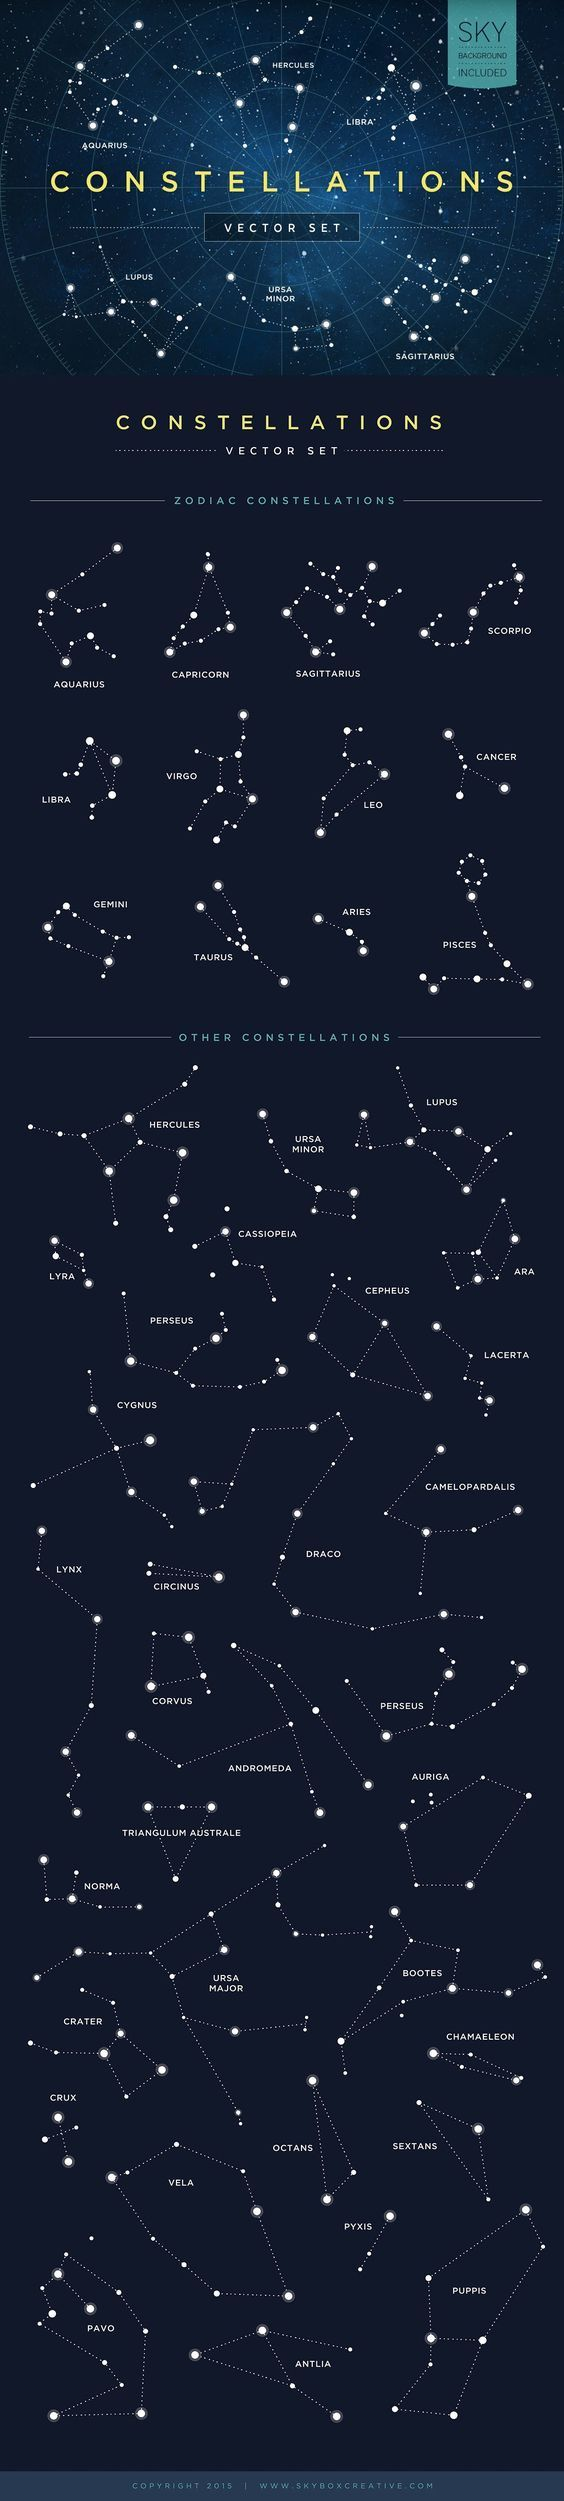 Constellations Vector Set by skyboxcreative #Illustration #Constellation   tatuajes | Spanish tatuajes  |tatuajes para mujeres | tatuajes para hombres  | diseños de tatuajes http://amzn.to/28PQlav